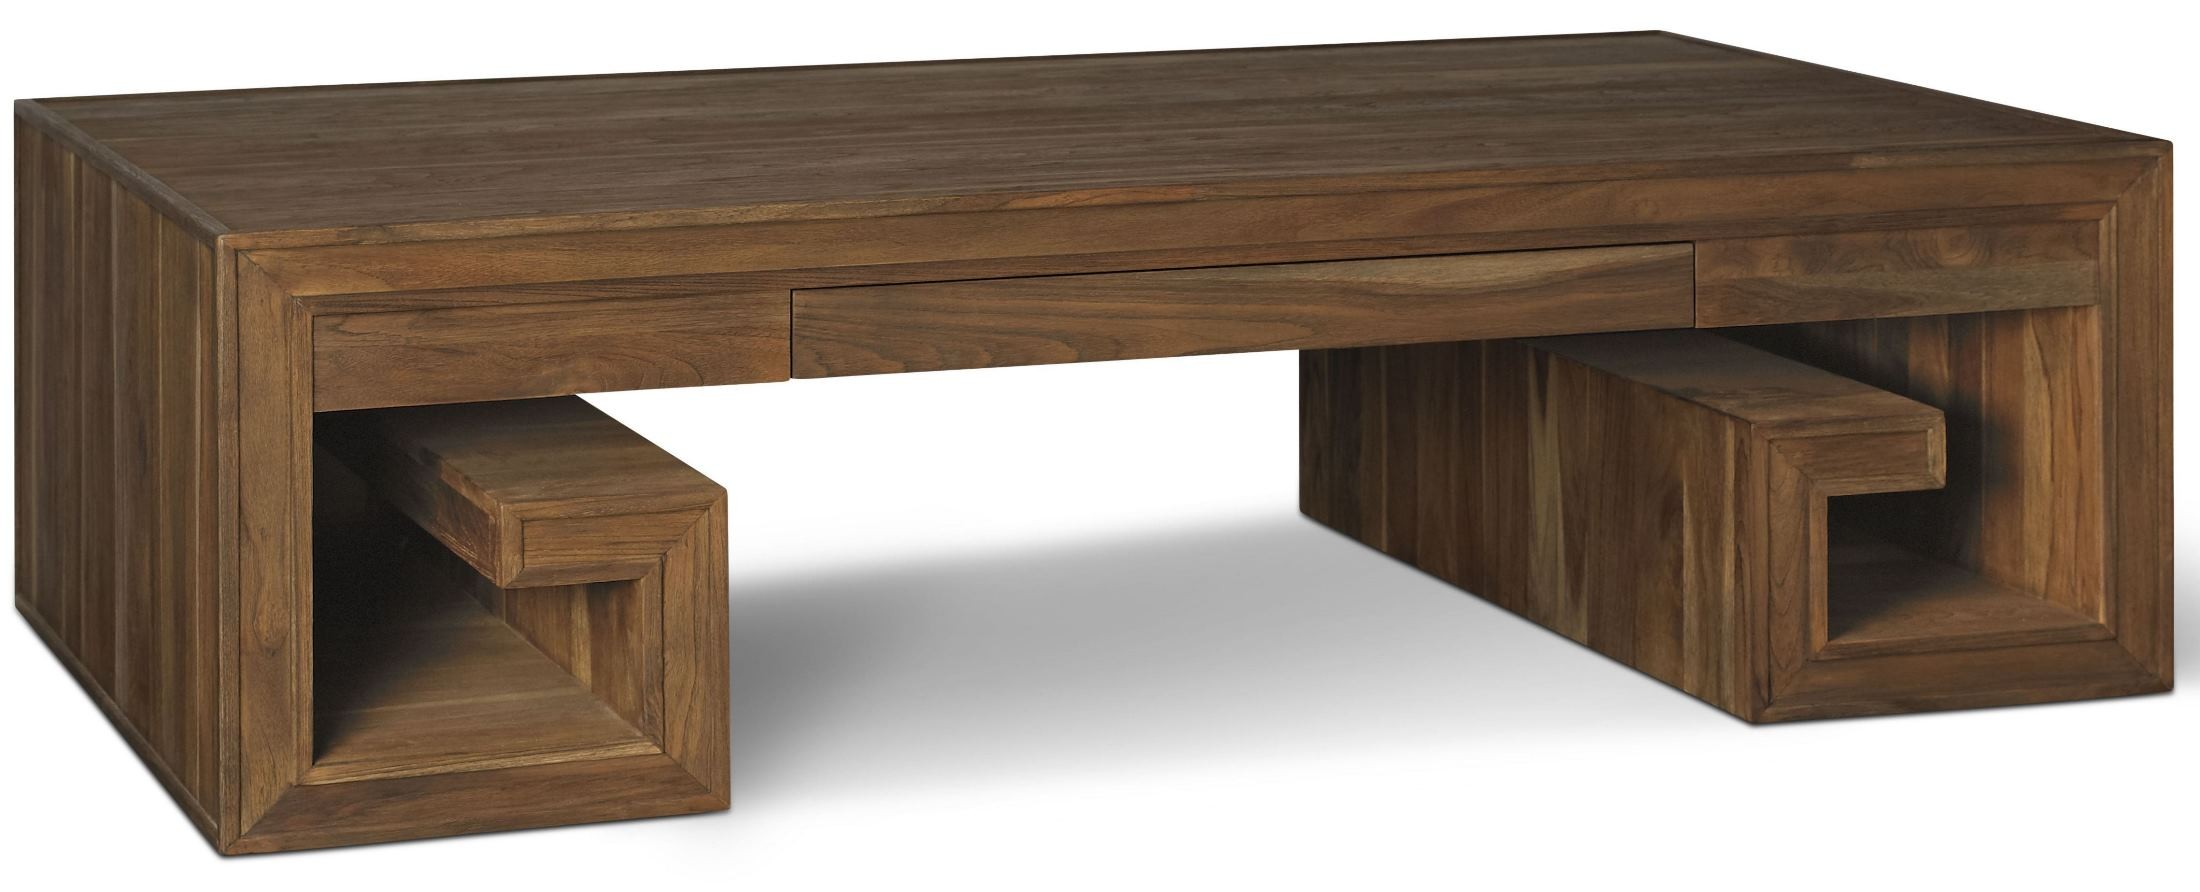 Crawford Sepia Greek Key Coffee Table Cw504 Brownstone